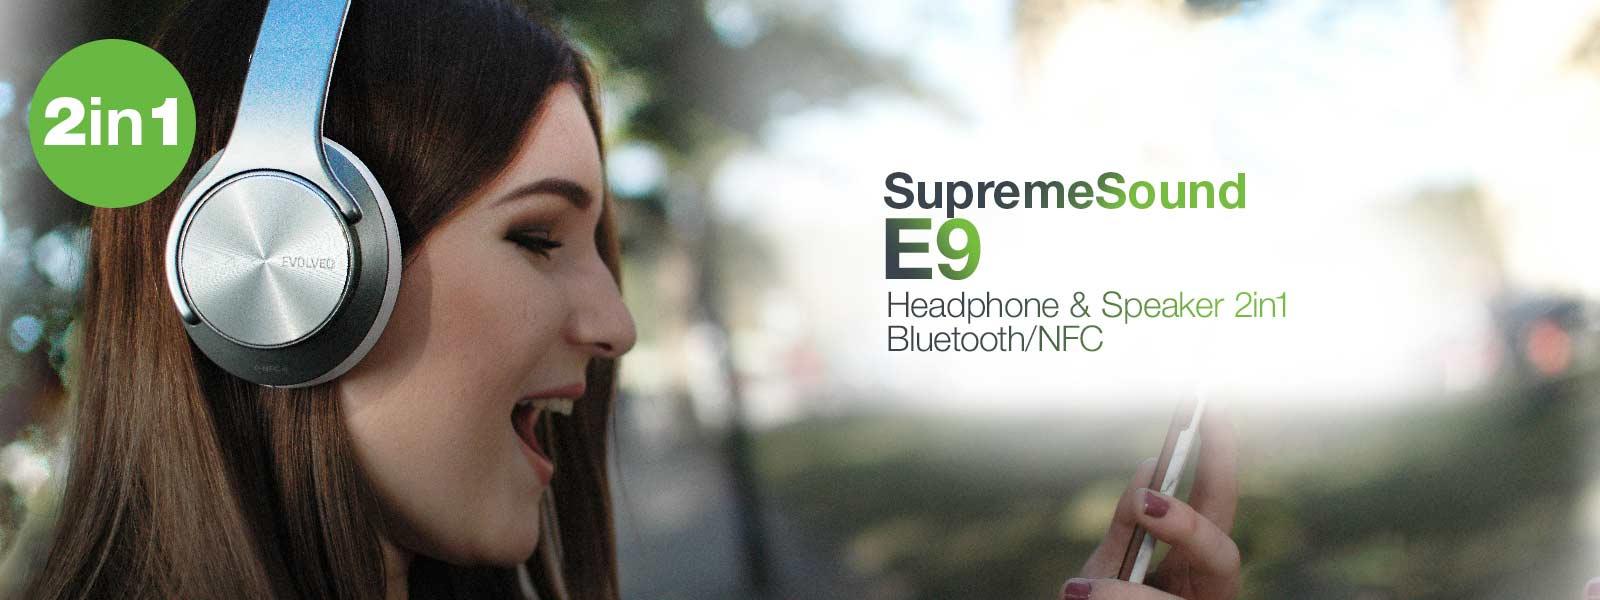 EVOLVEO SupremeSound E9